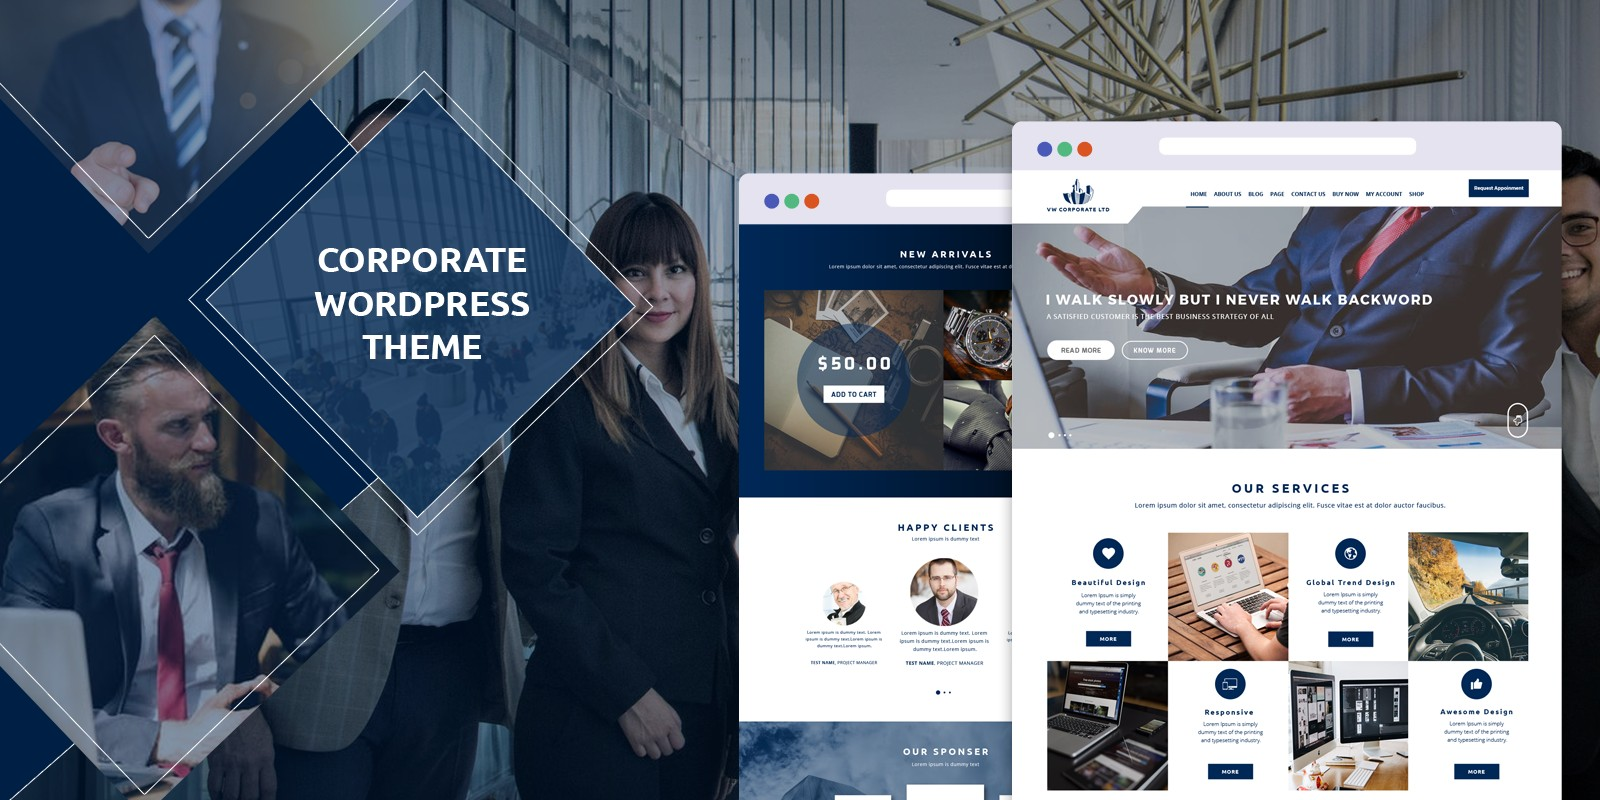 VW Corporate Pro - WordPress Theme